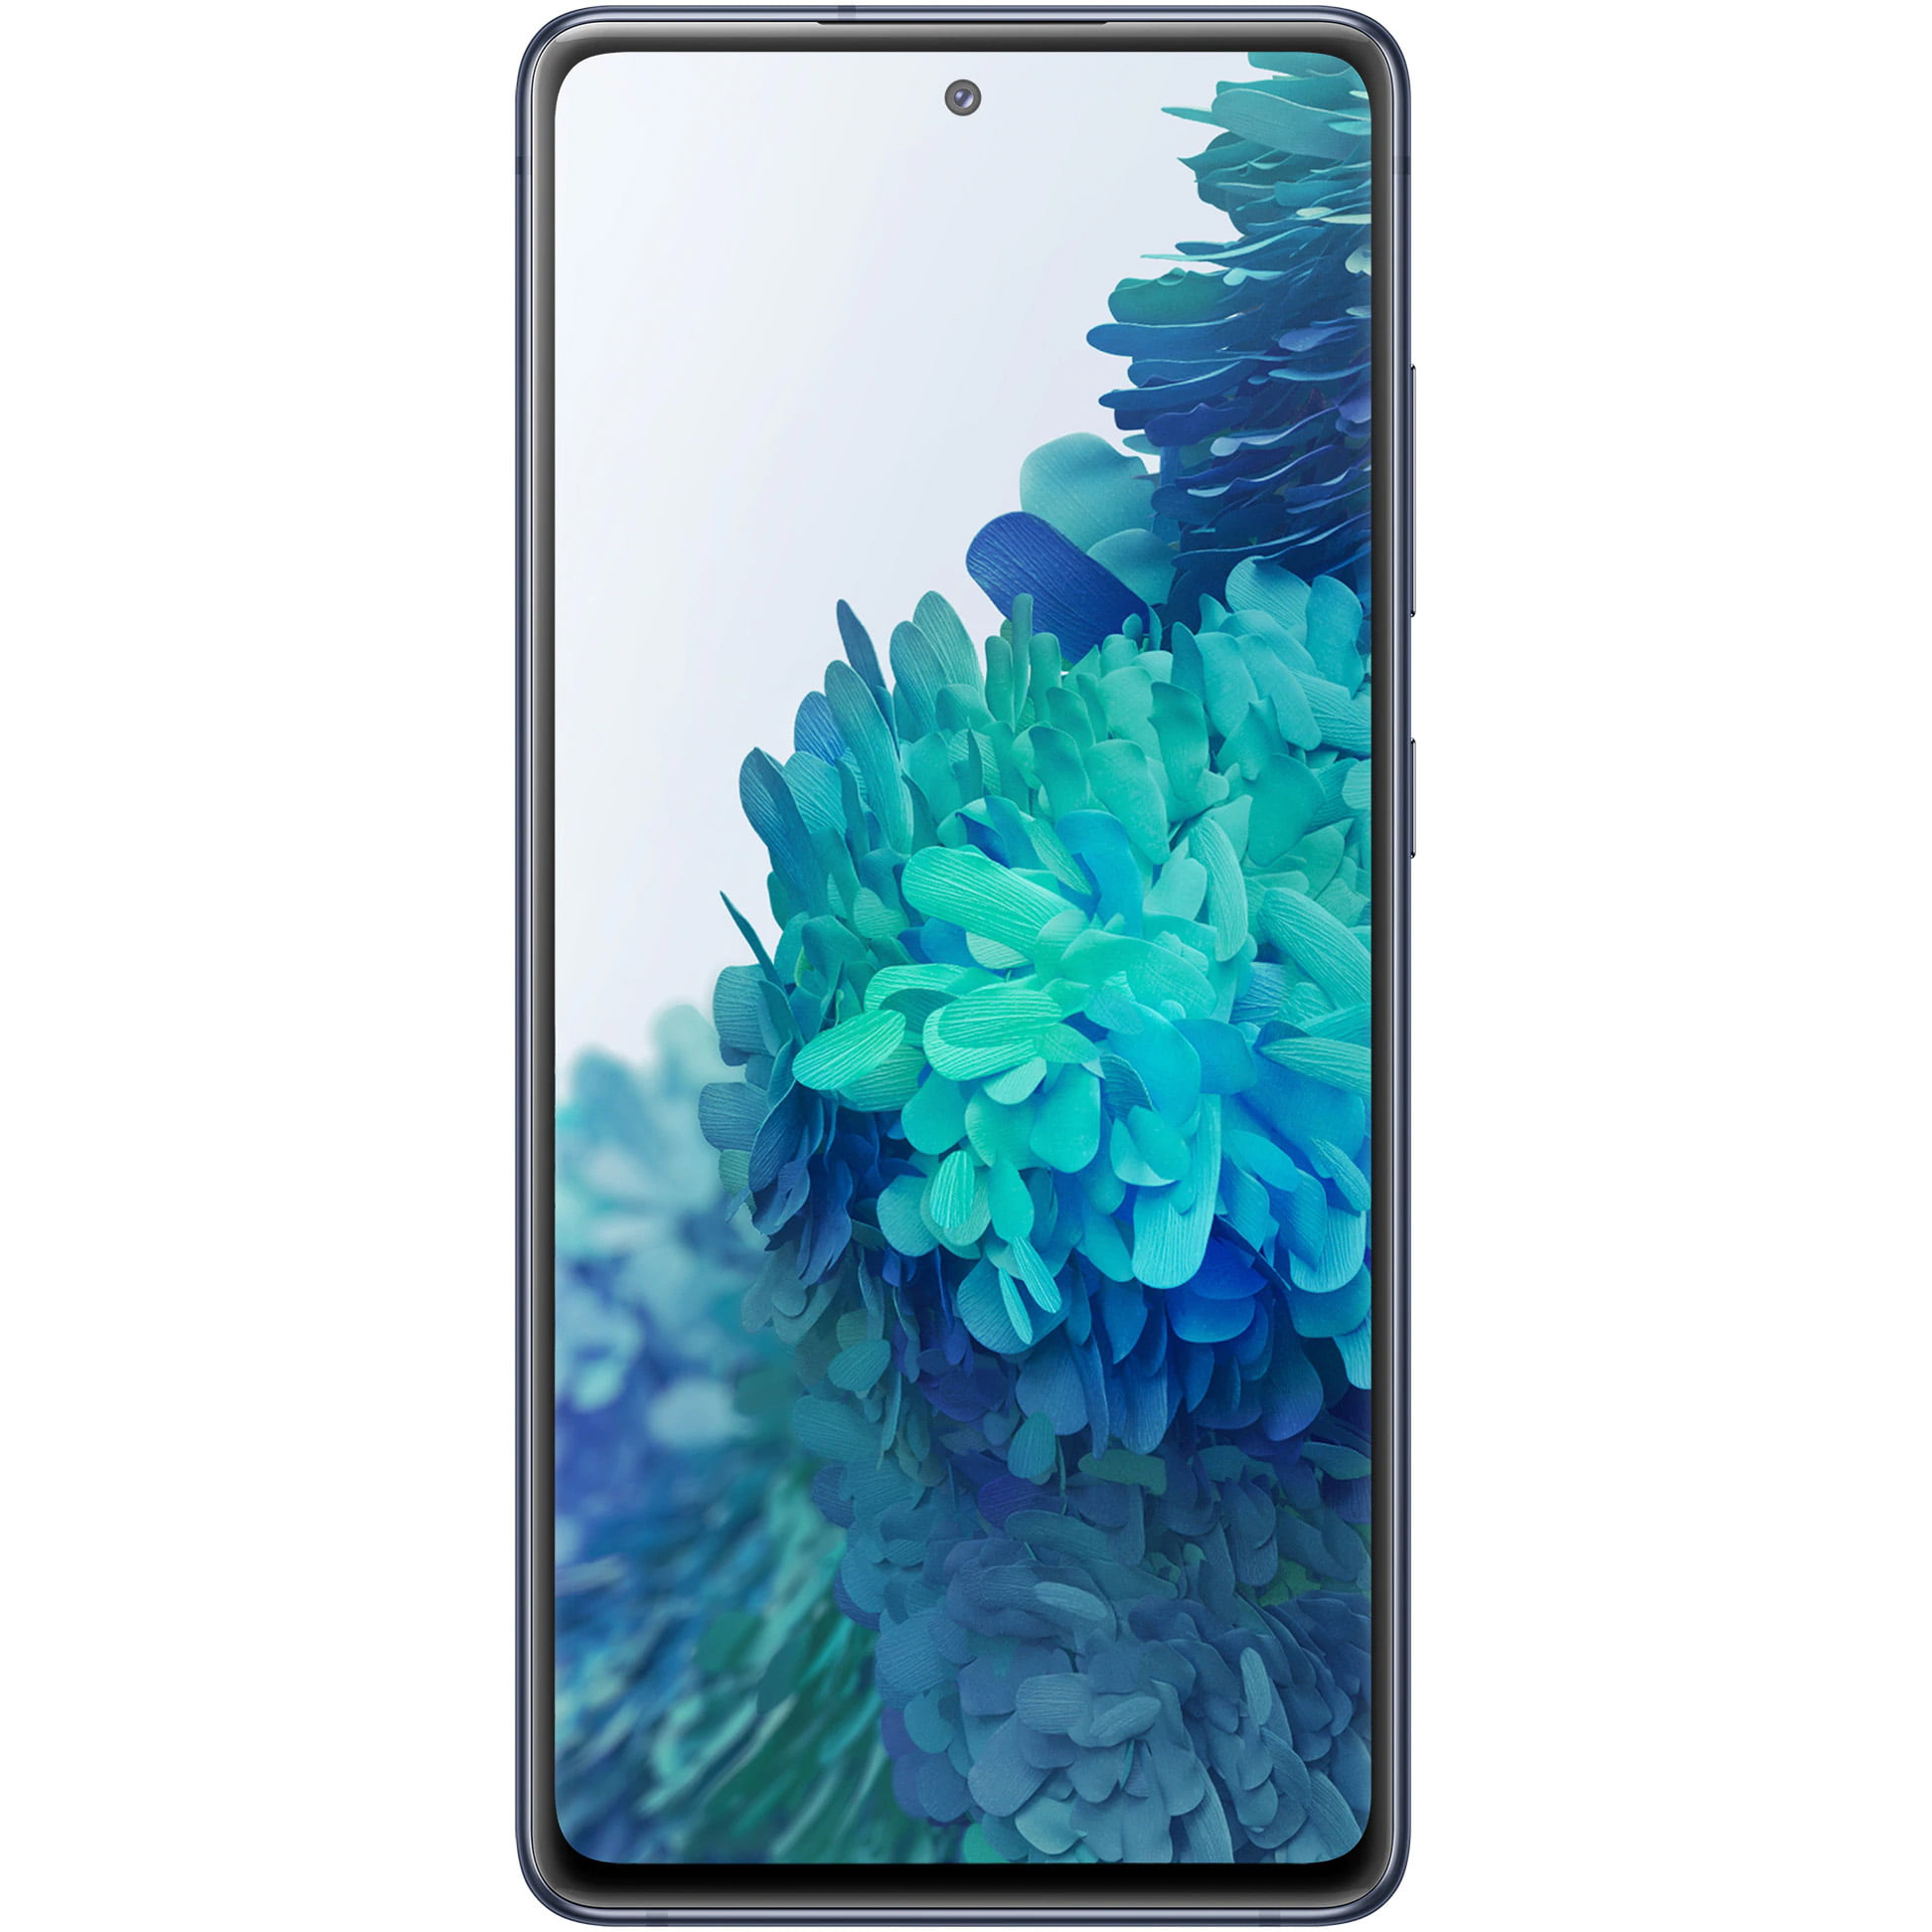 Telefon mobil Samsung Galaxy S20 FE, Dual SIM, 128GB, 6GB RAM, 5G, Cloud Navy